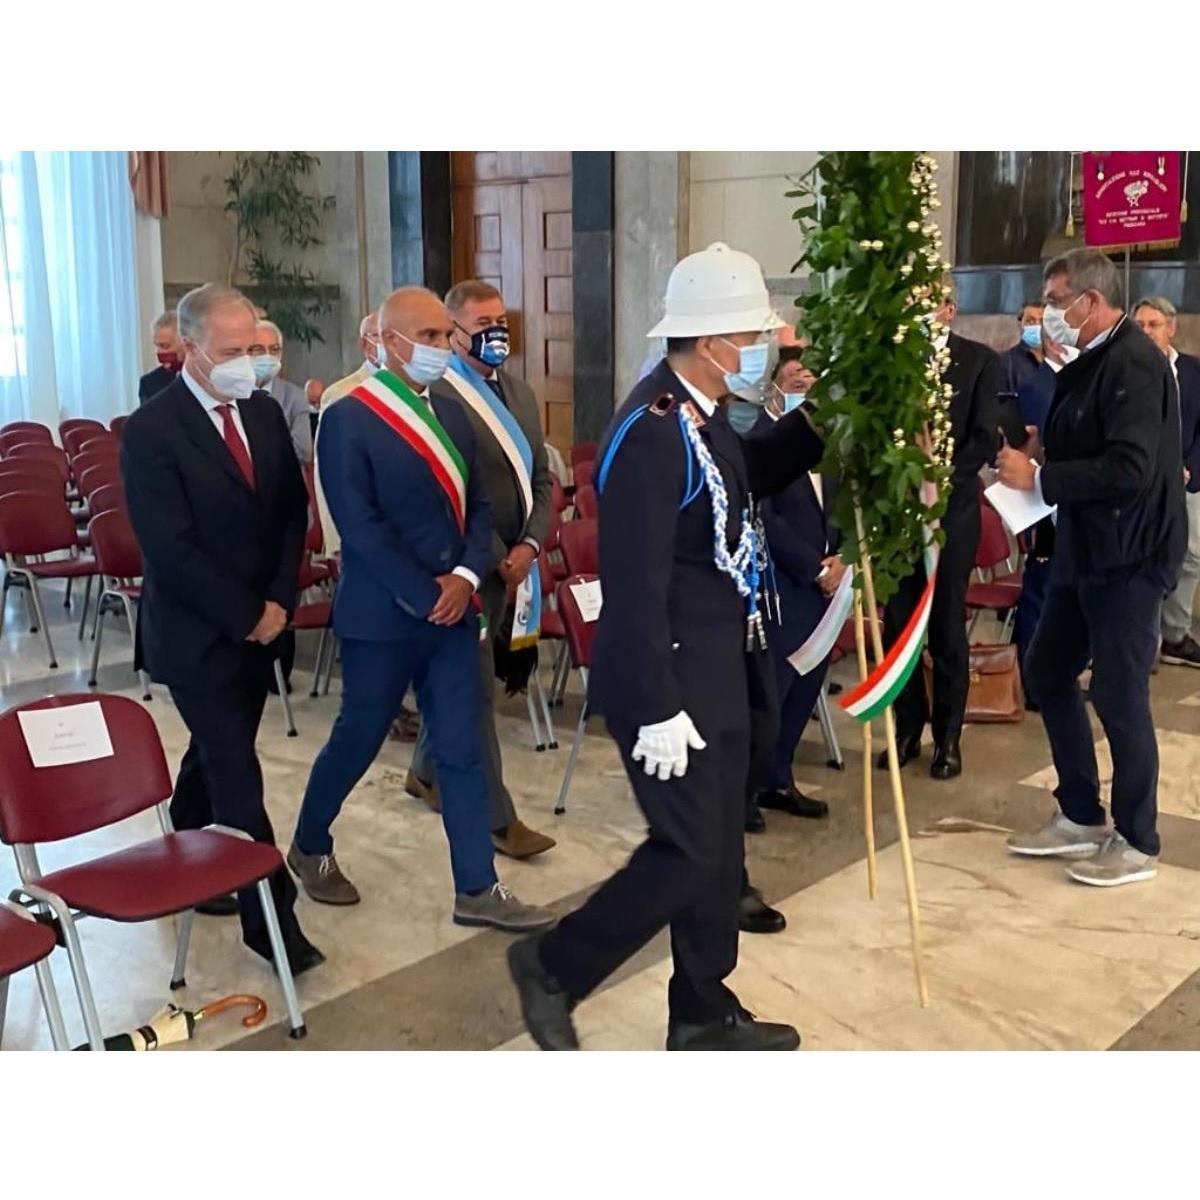 Pescara: 31 agosto 2020 ricordo vittime